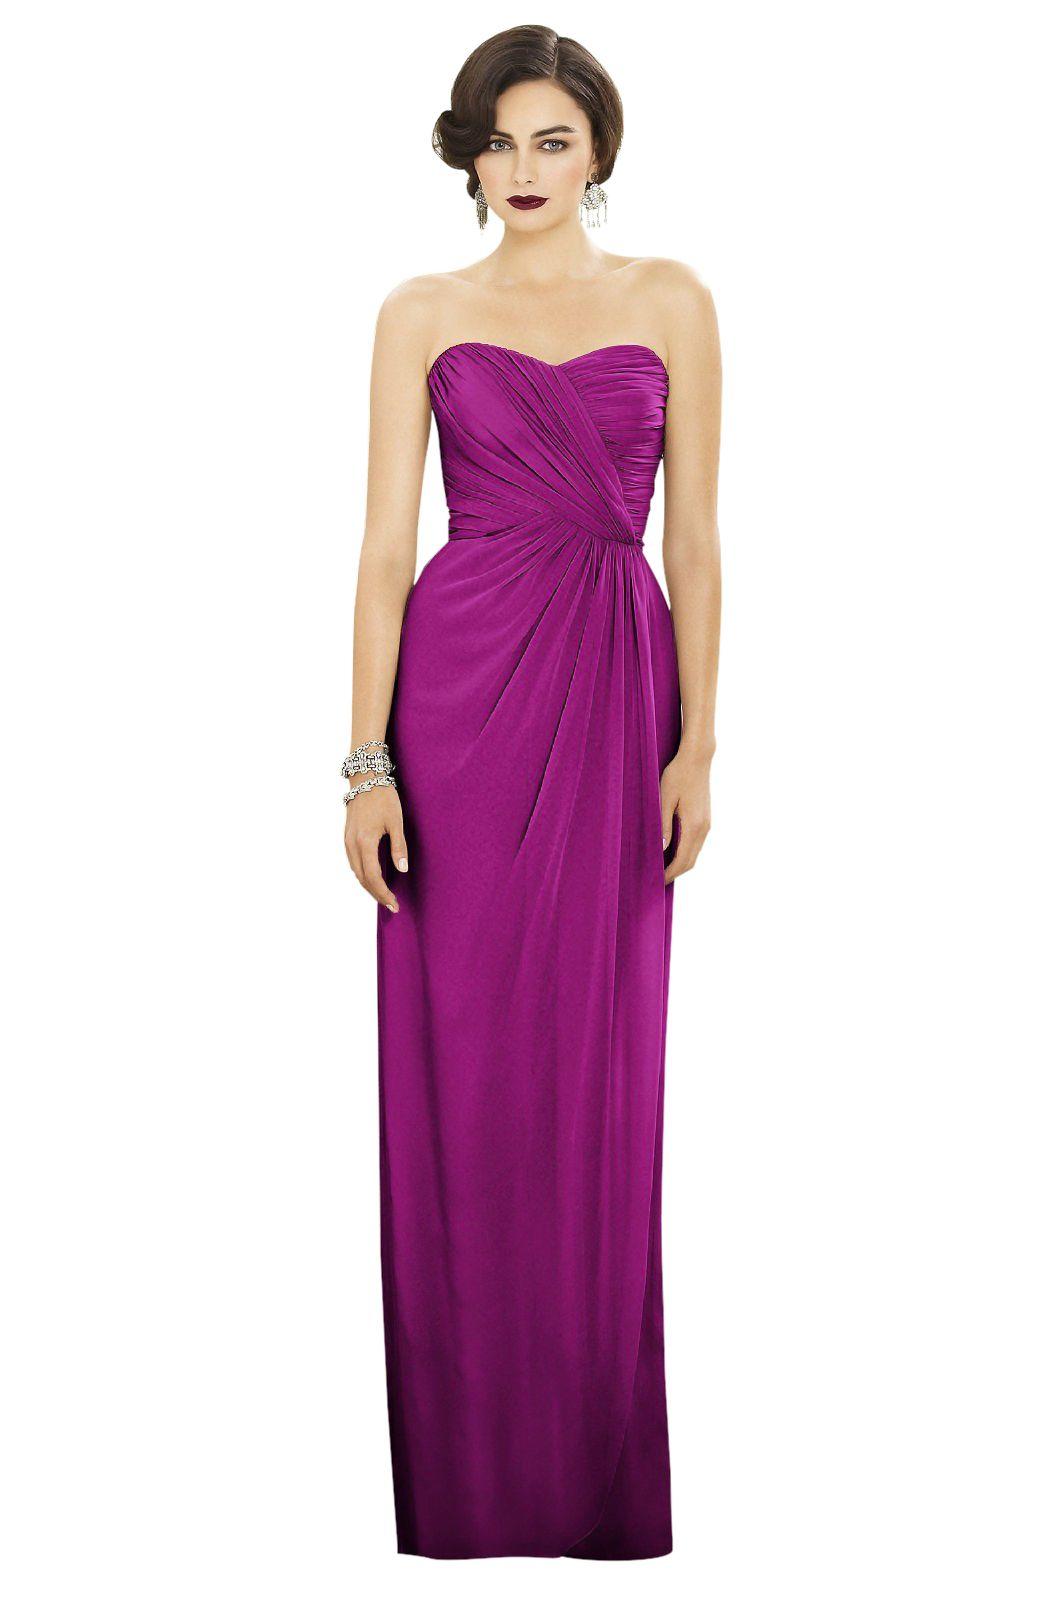 Dessy 2882 Bridesmaid Dress   Weddington Way   Wedding   Pinterest ...